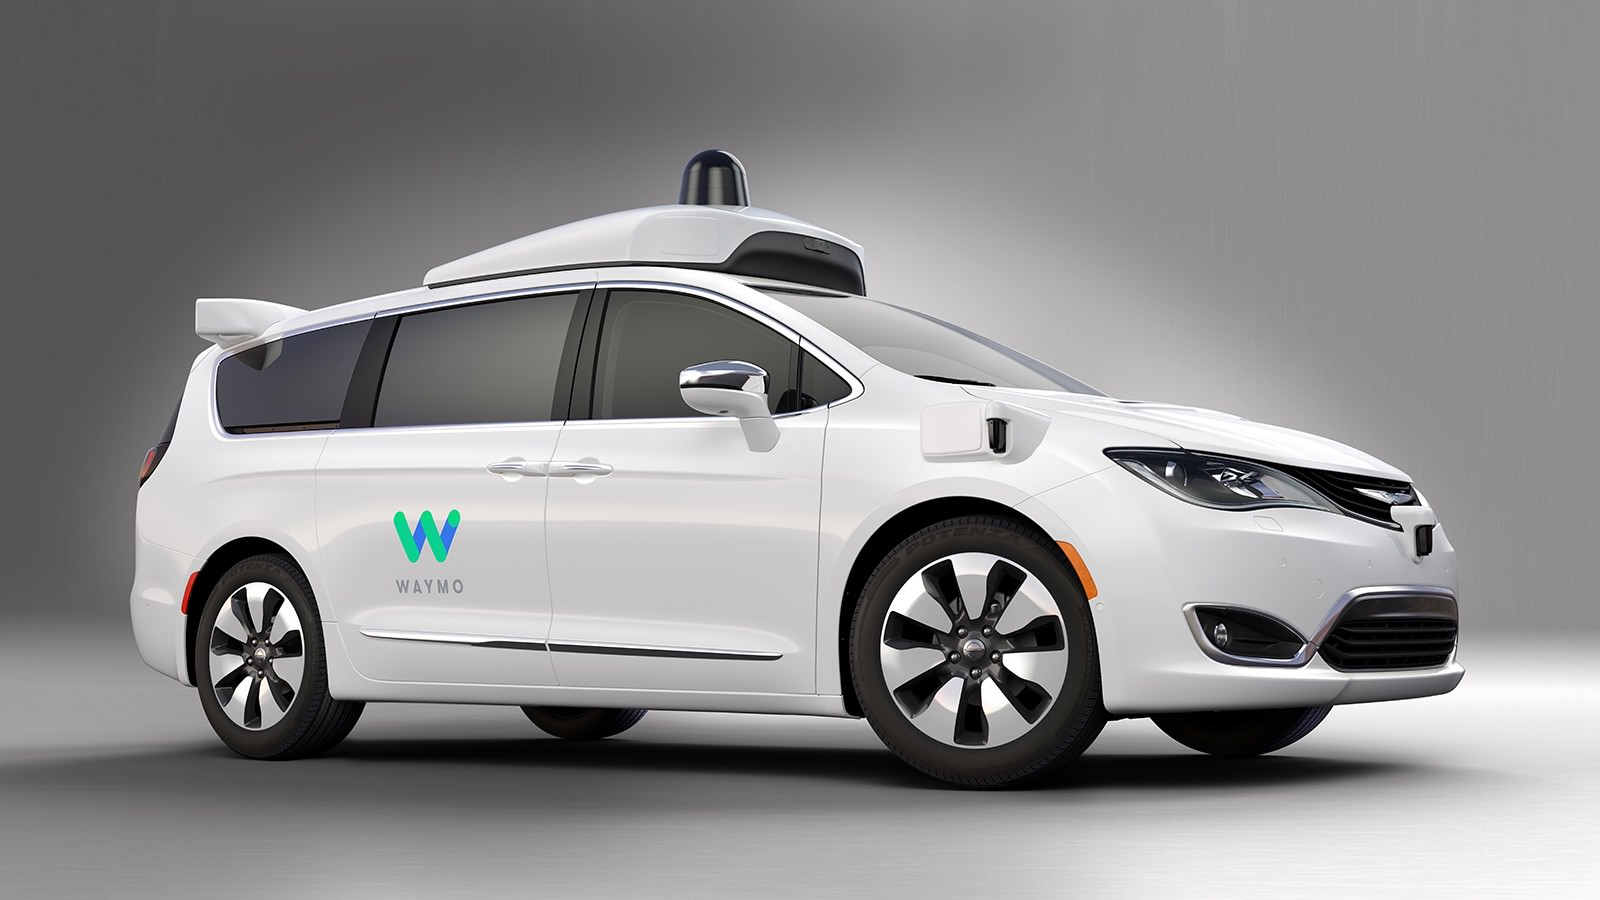 self-driving car news: waymo goes driverless in caliornia, china